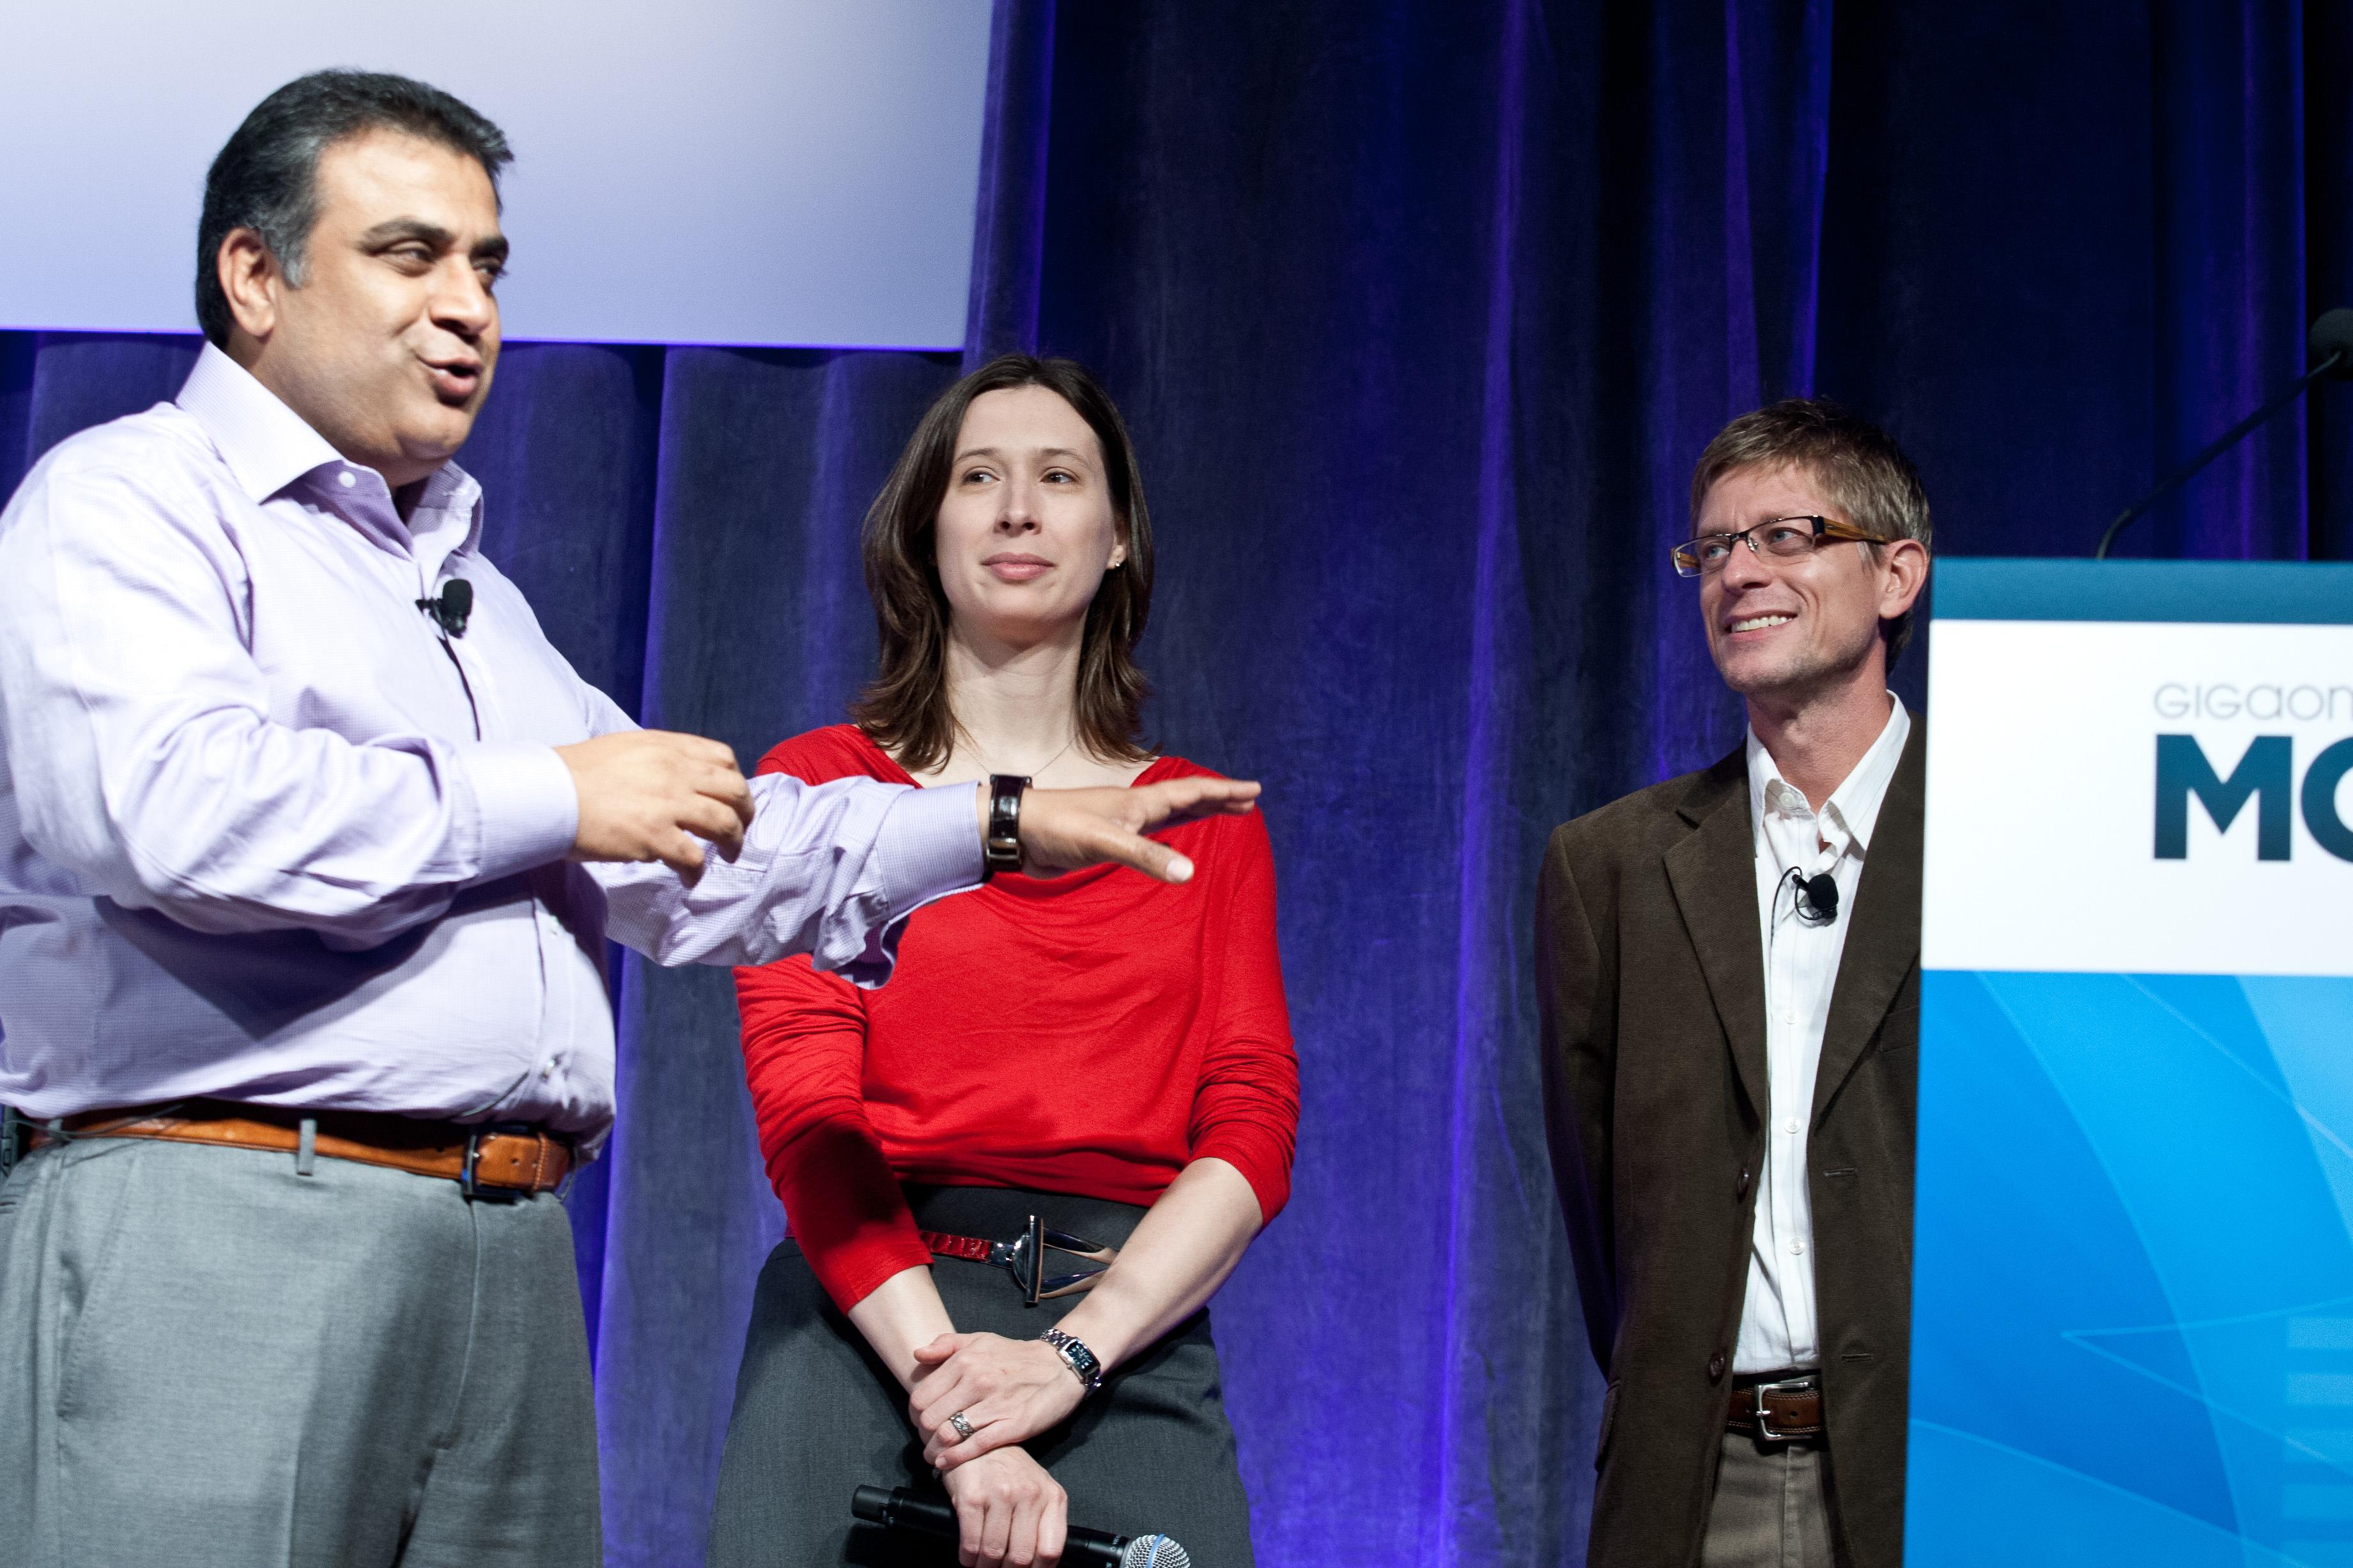 Mobilize 2011: Om Malik – Founder, GigaOM; Stacey Higginbotham – Senior Writer, GigaOM; Kevin Tofel – Senior Writer, GigaOM